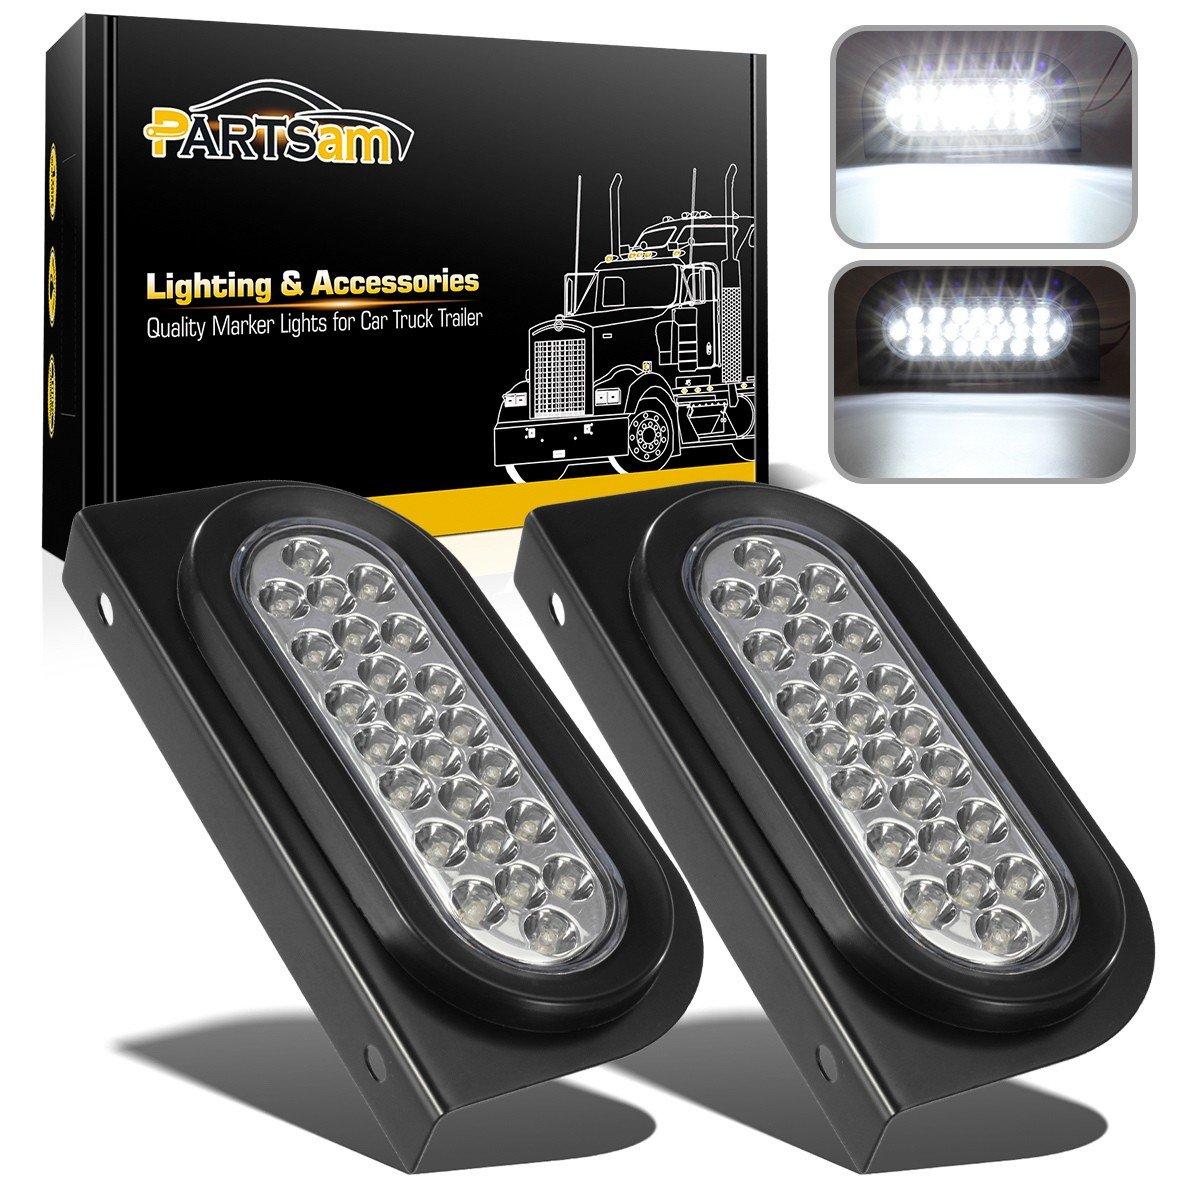 "Partsam 2pcs Waterproof 6"" inch Oval Sealed Stop Turn Tail Reverse Backup Fog Marker White 24 LED Truck Trailer Light Kit Flush Mount w/Mounting Brackets"